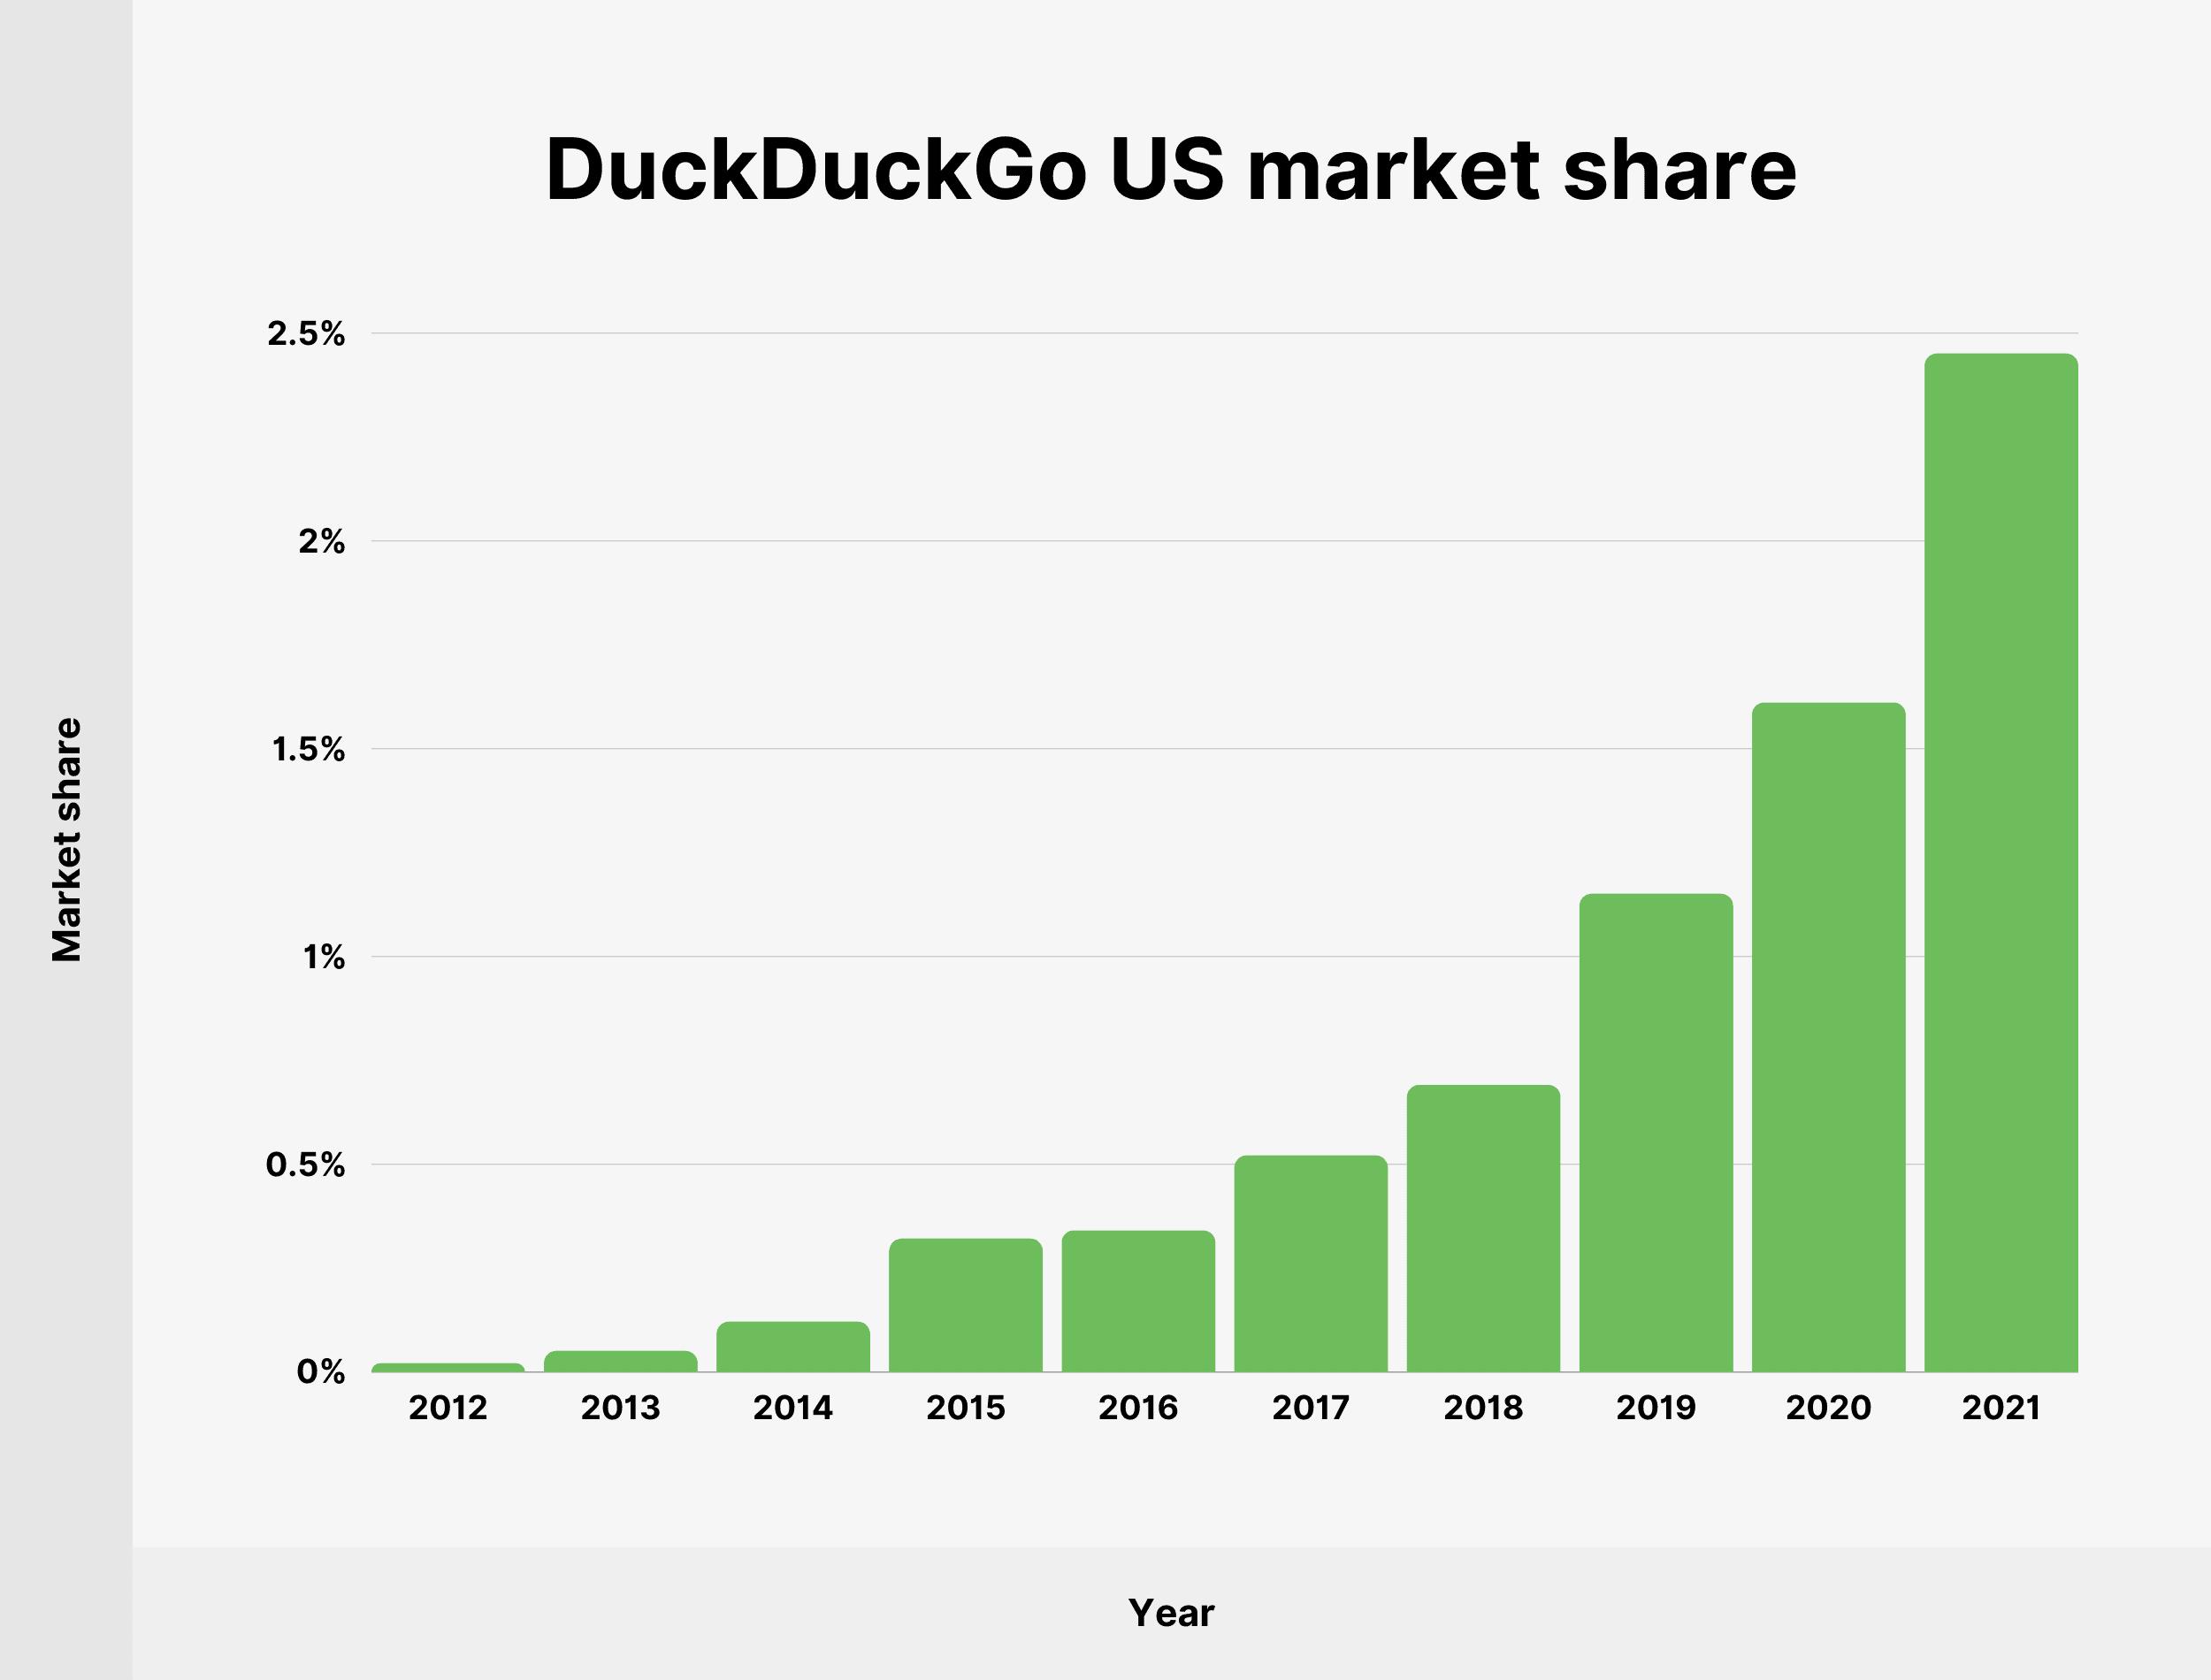 DuckDuckGo US market share